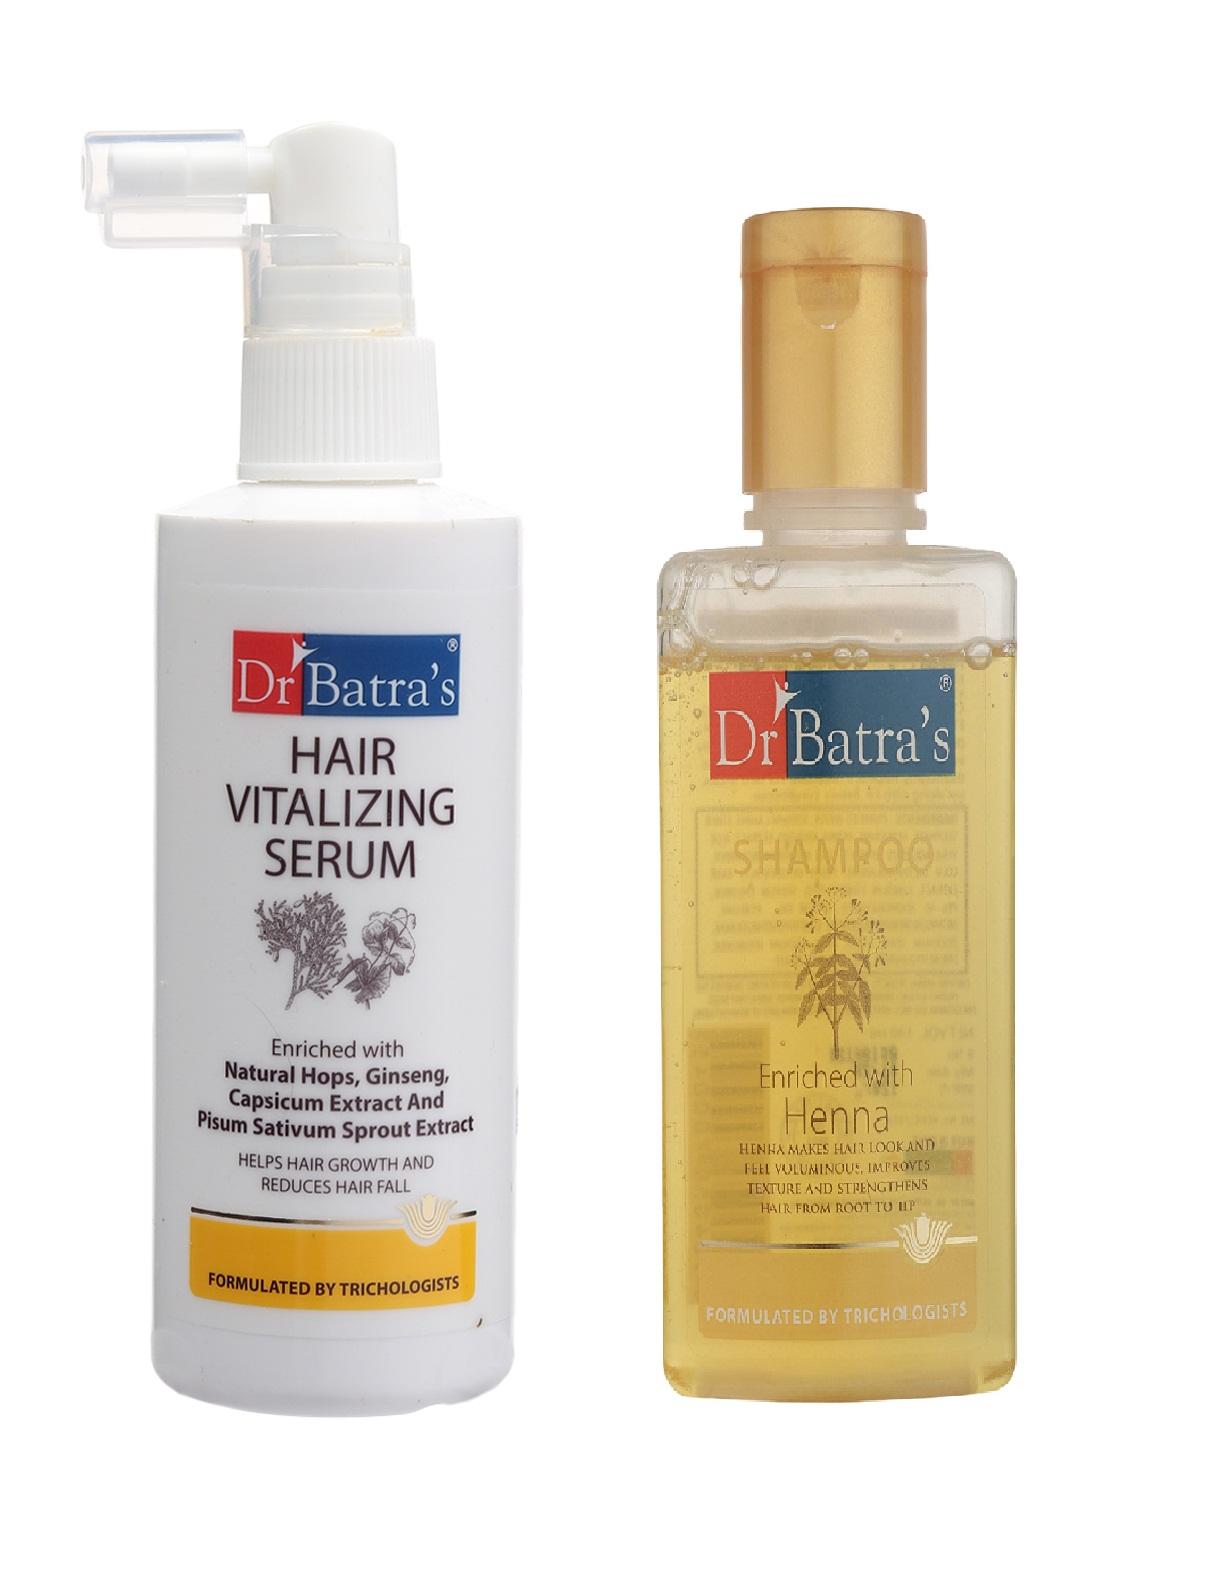 Dr Batra's | Dr Batra's Hair Vitalizing Serum and Henna Shampoo Combo (100)